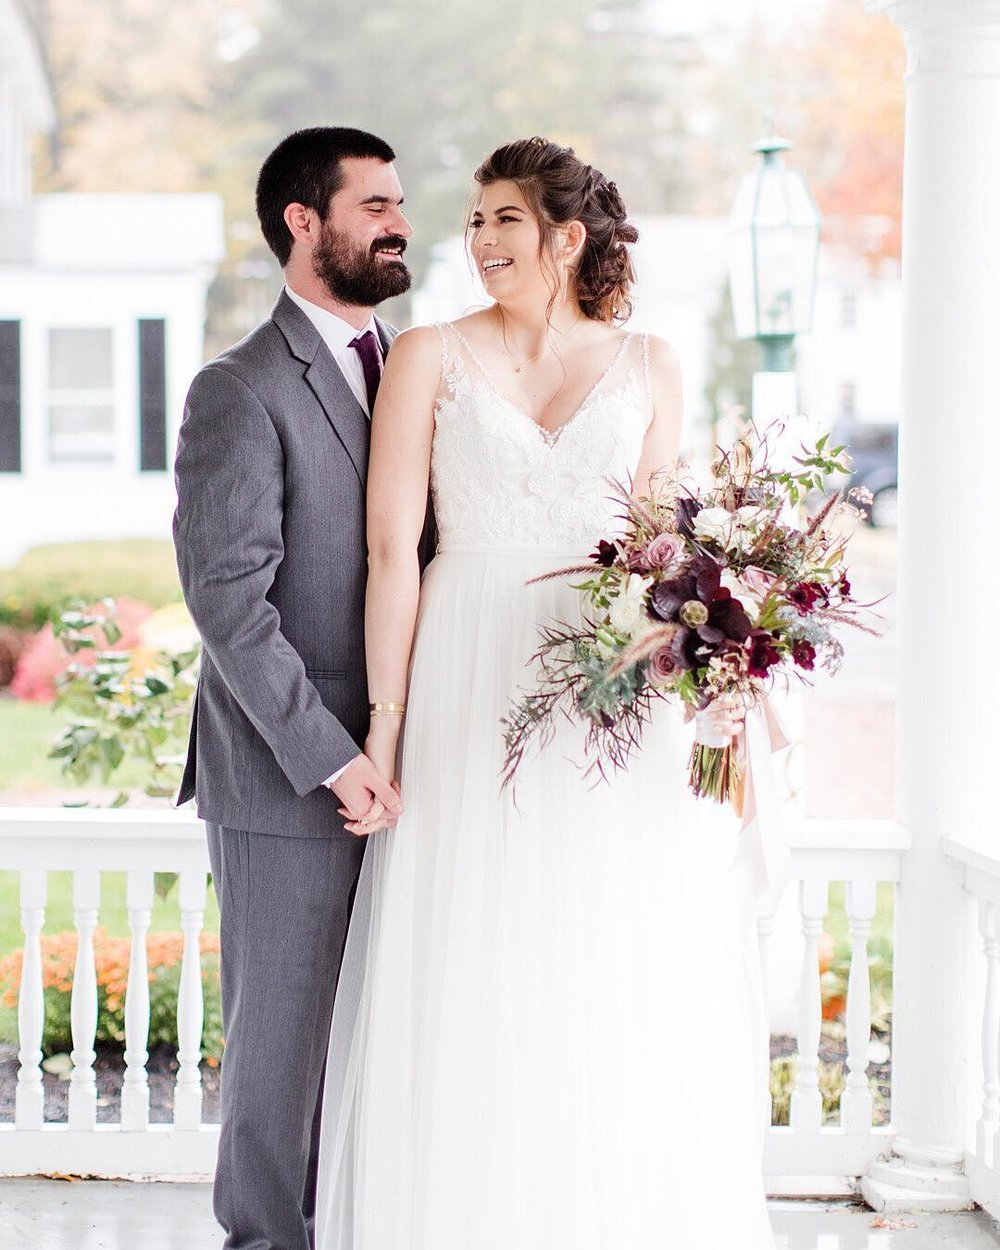 Samantha + Ryan share a laugh during their portrait session during their wedding at Publick House Historic Inn (Sturbridge, MA)